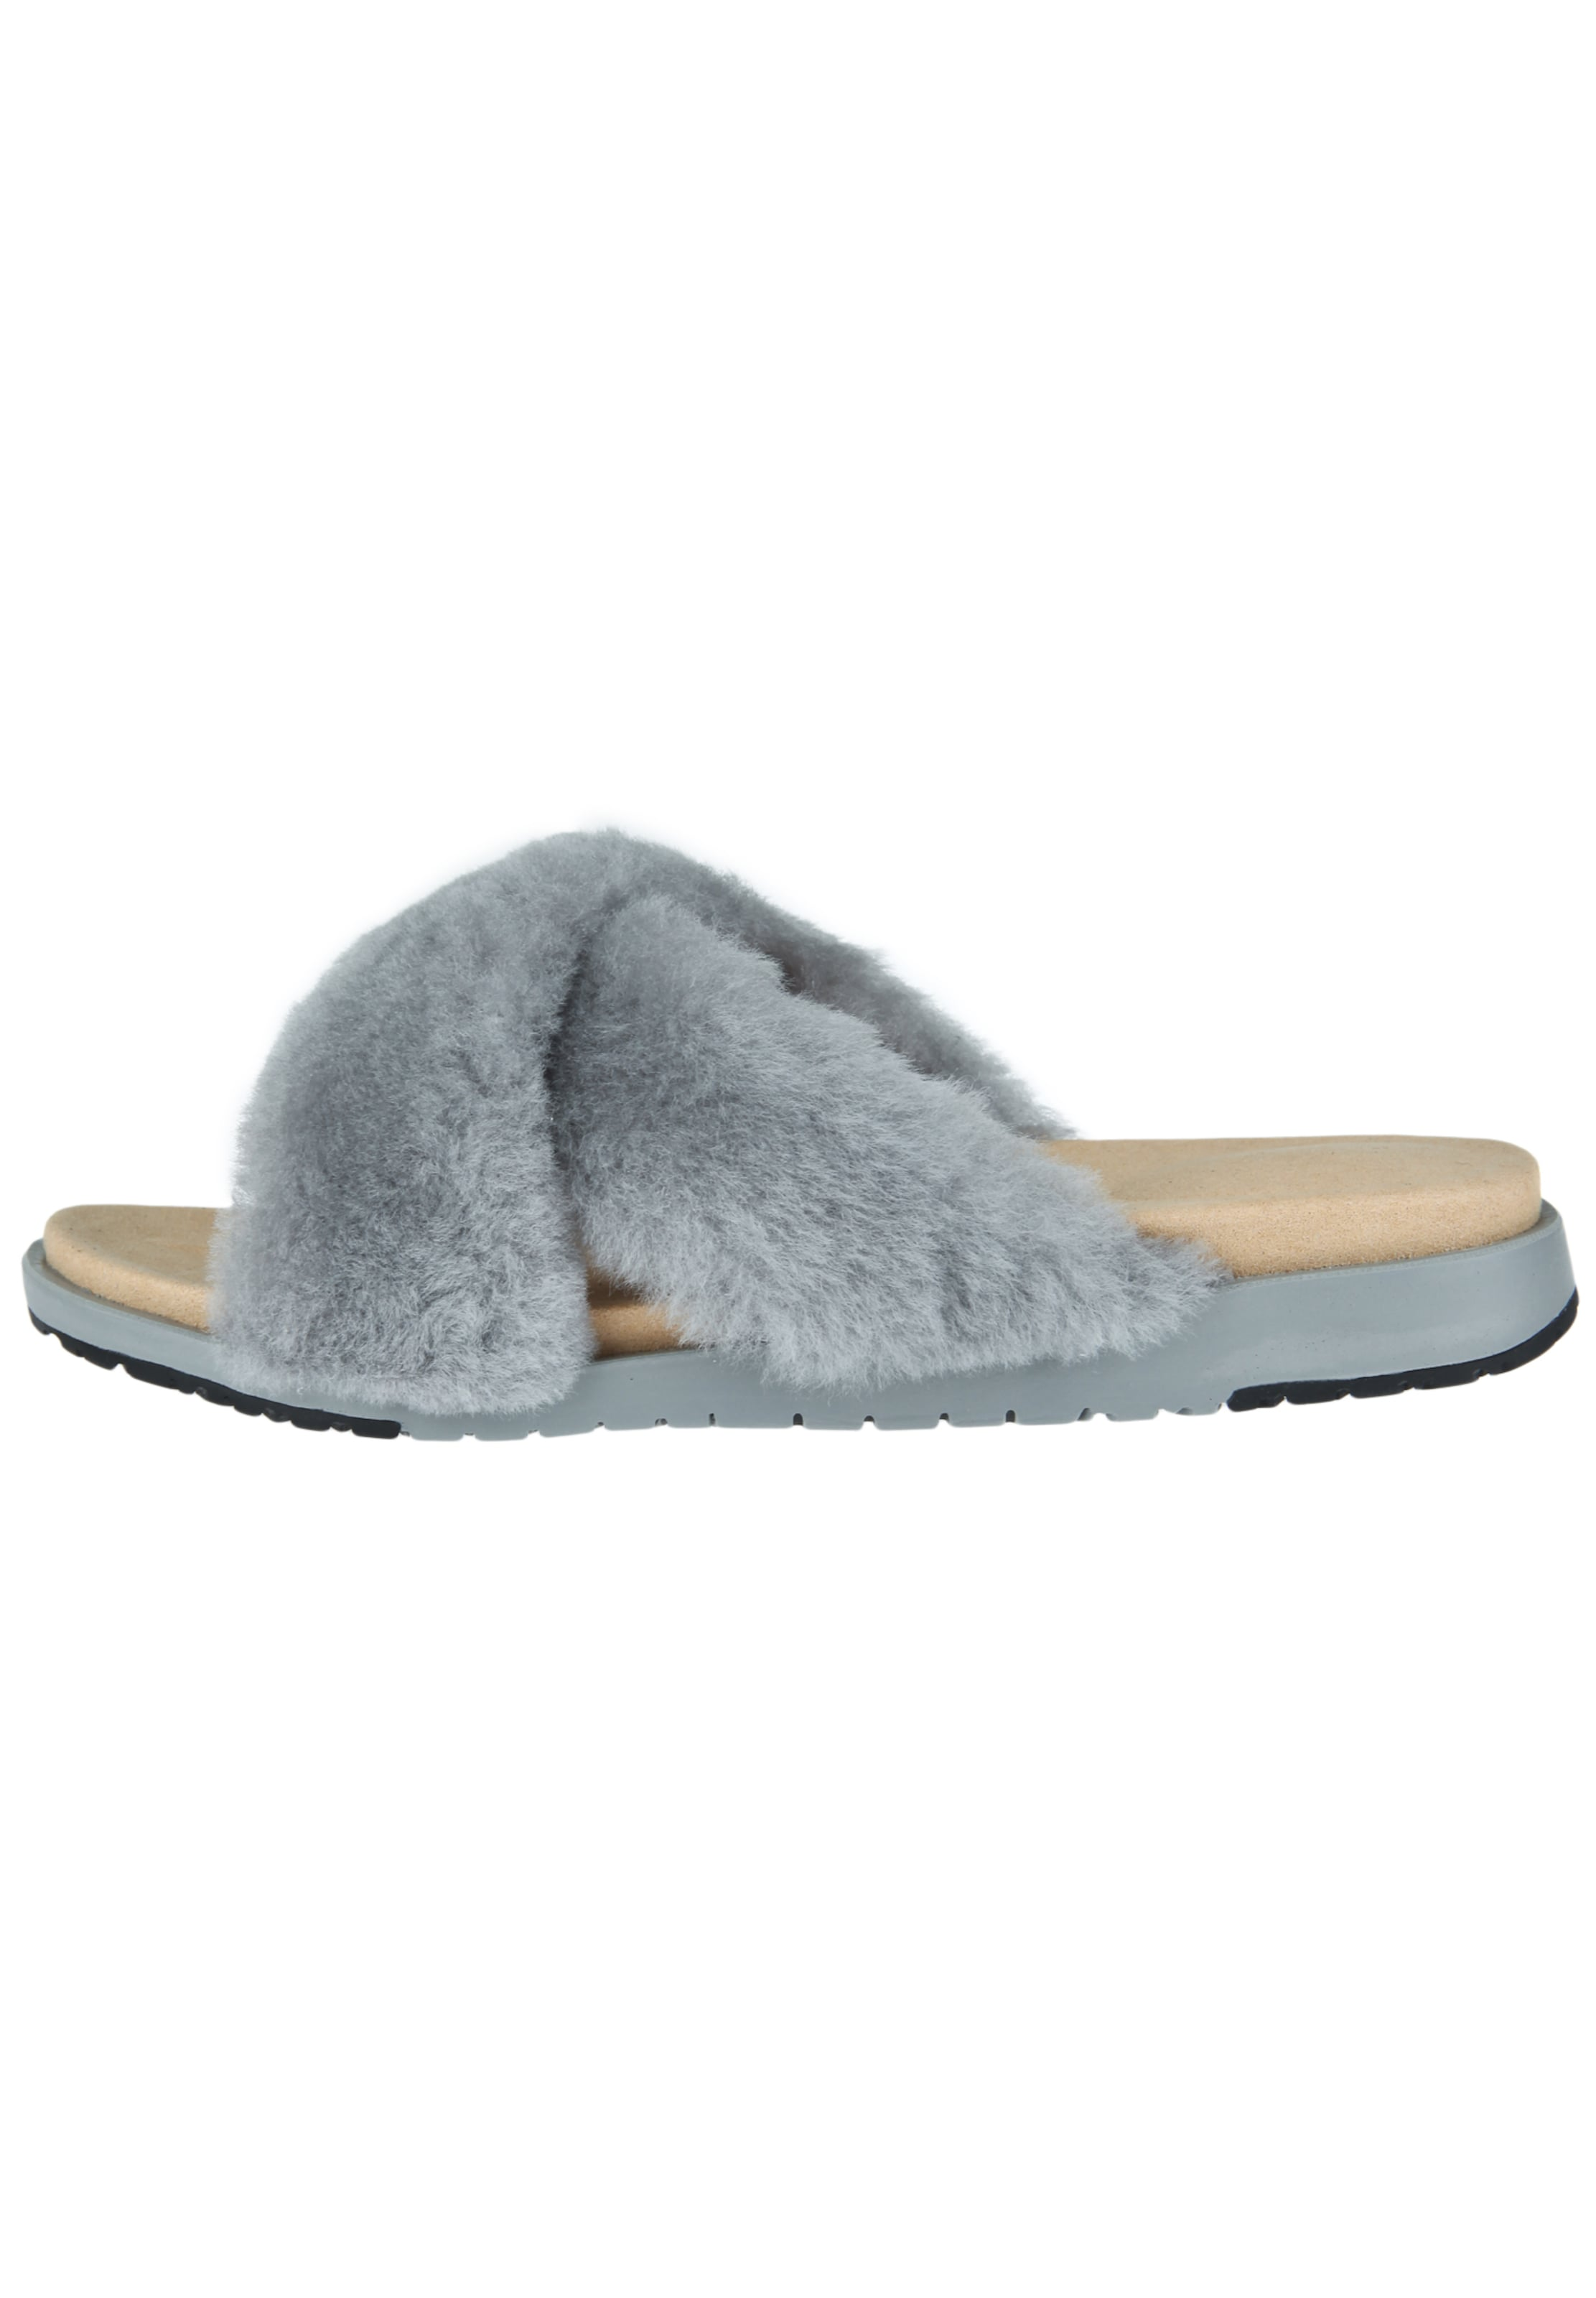 In Grau Australia Pantolette Emu 'mareeba' nX8wPZkN0O